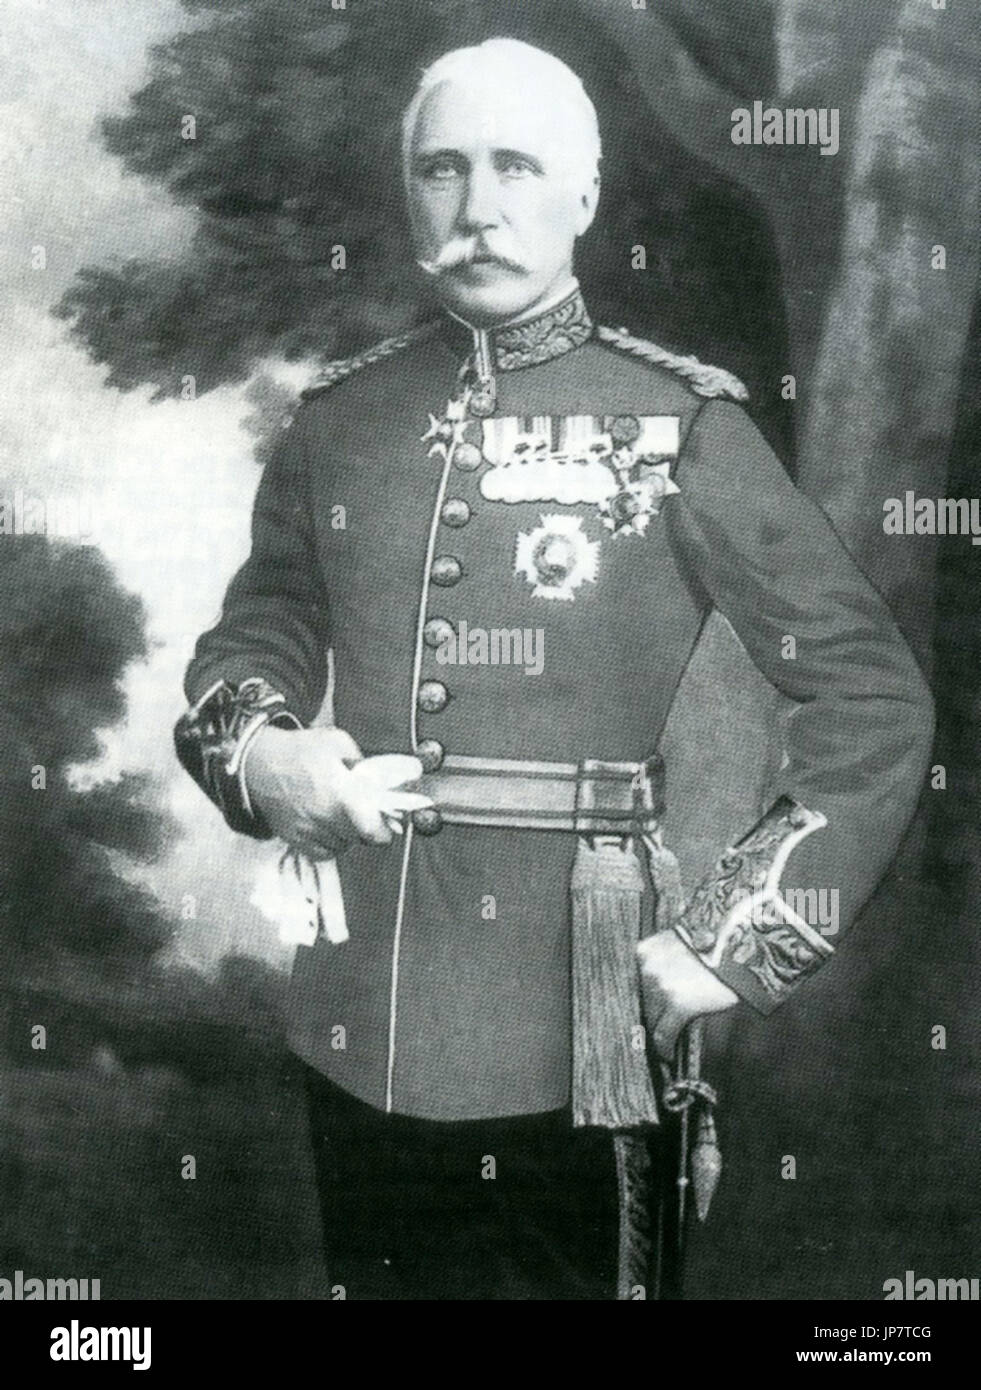 BINDON BLOOD (1842-1940) British Army Commander - Stock Image